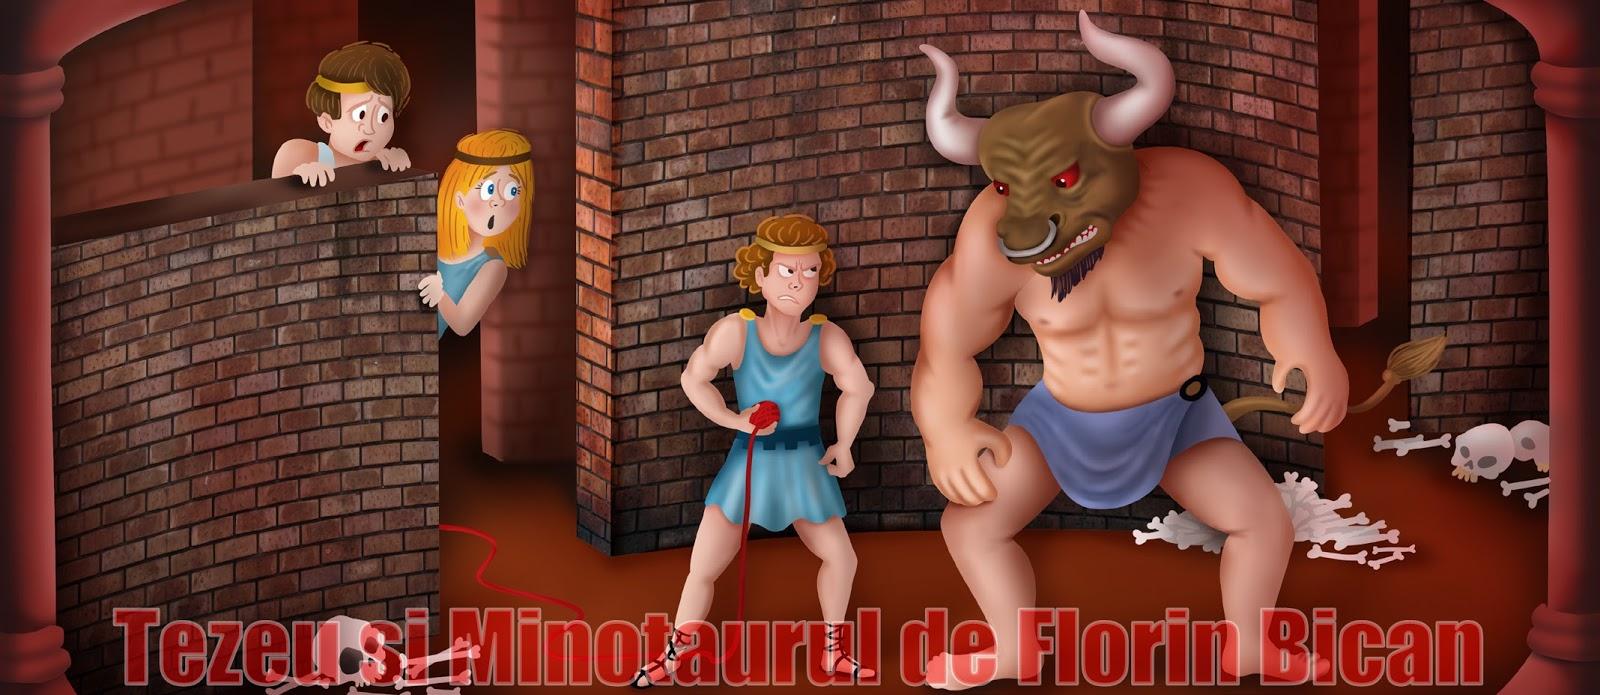 Tezeu și Minotaurul